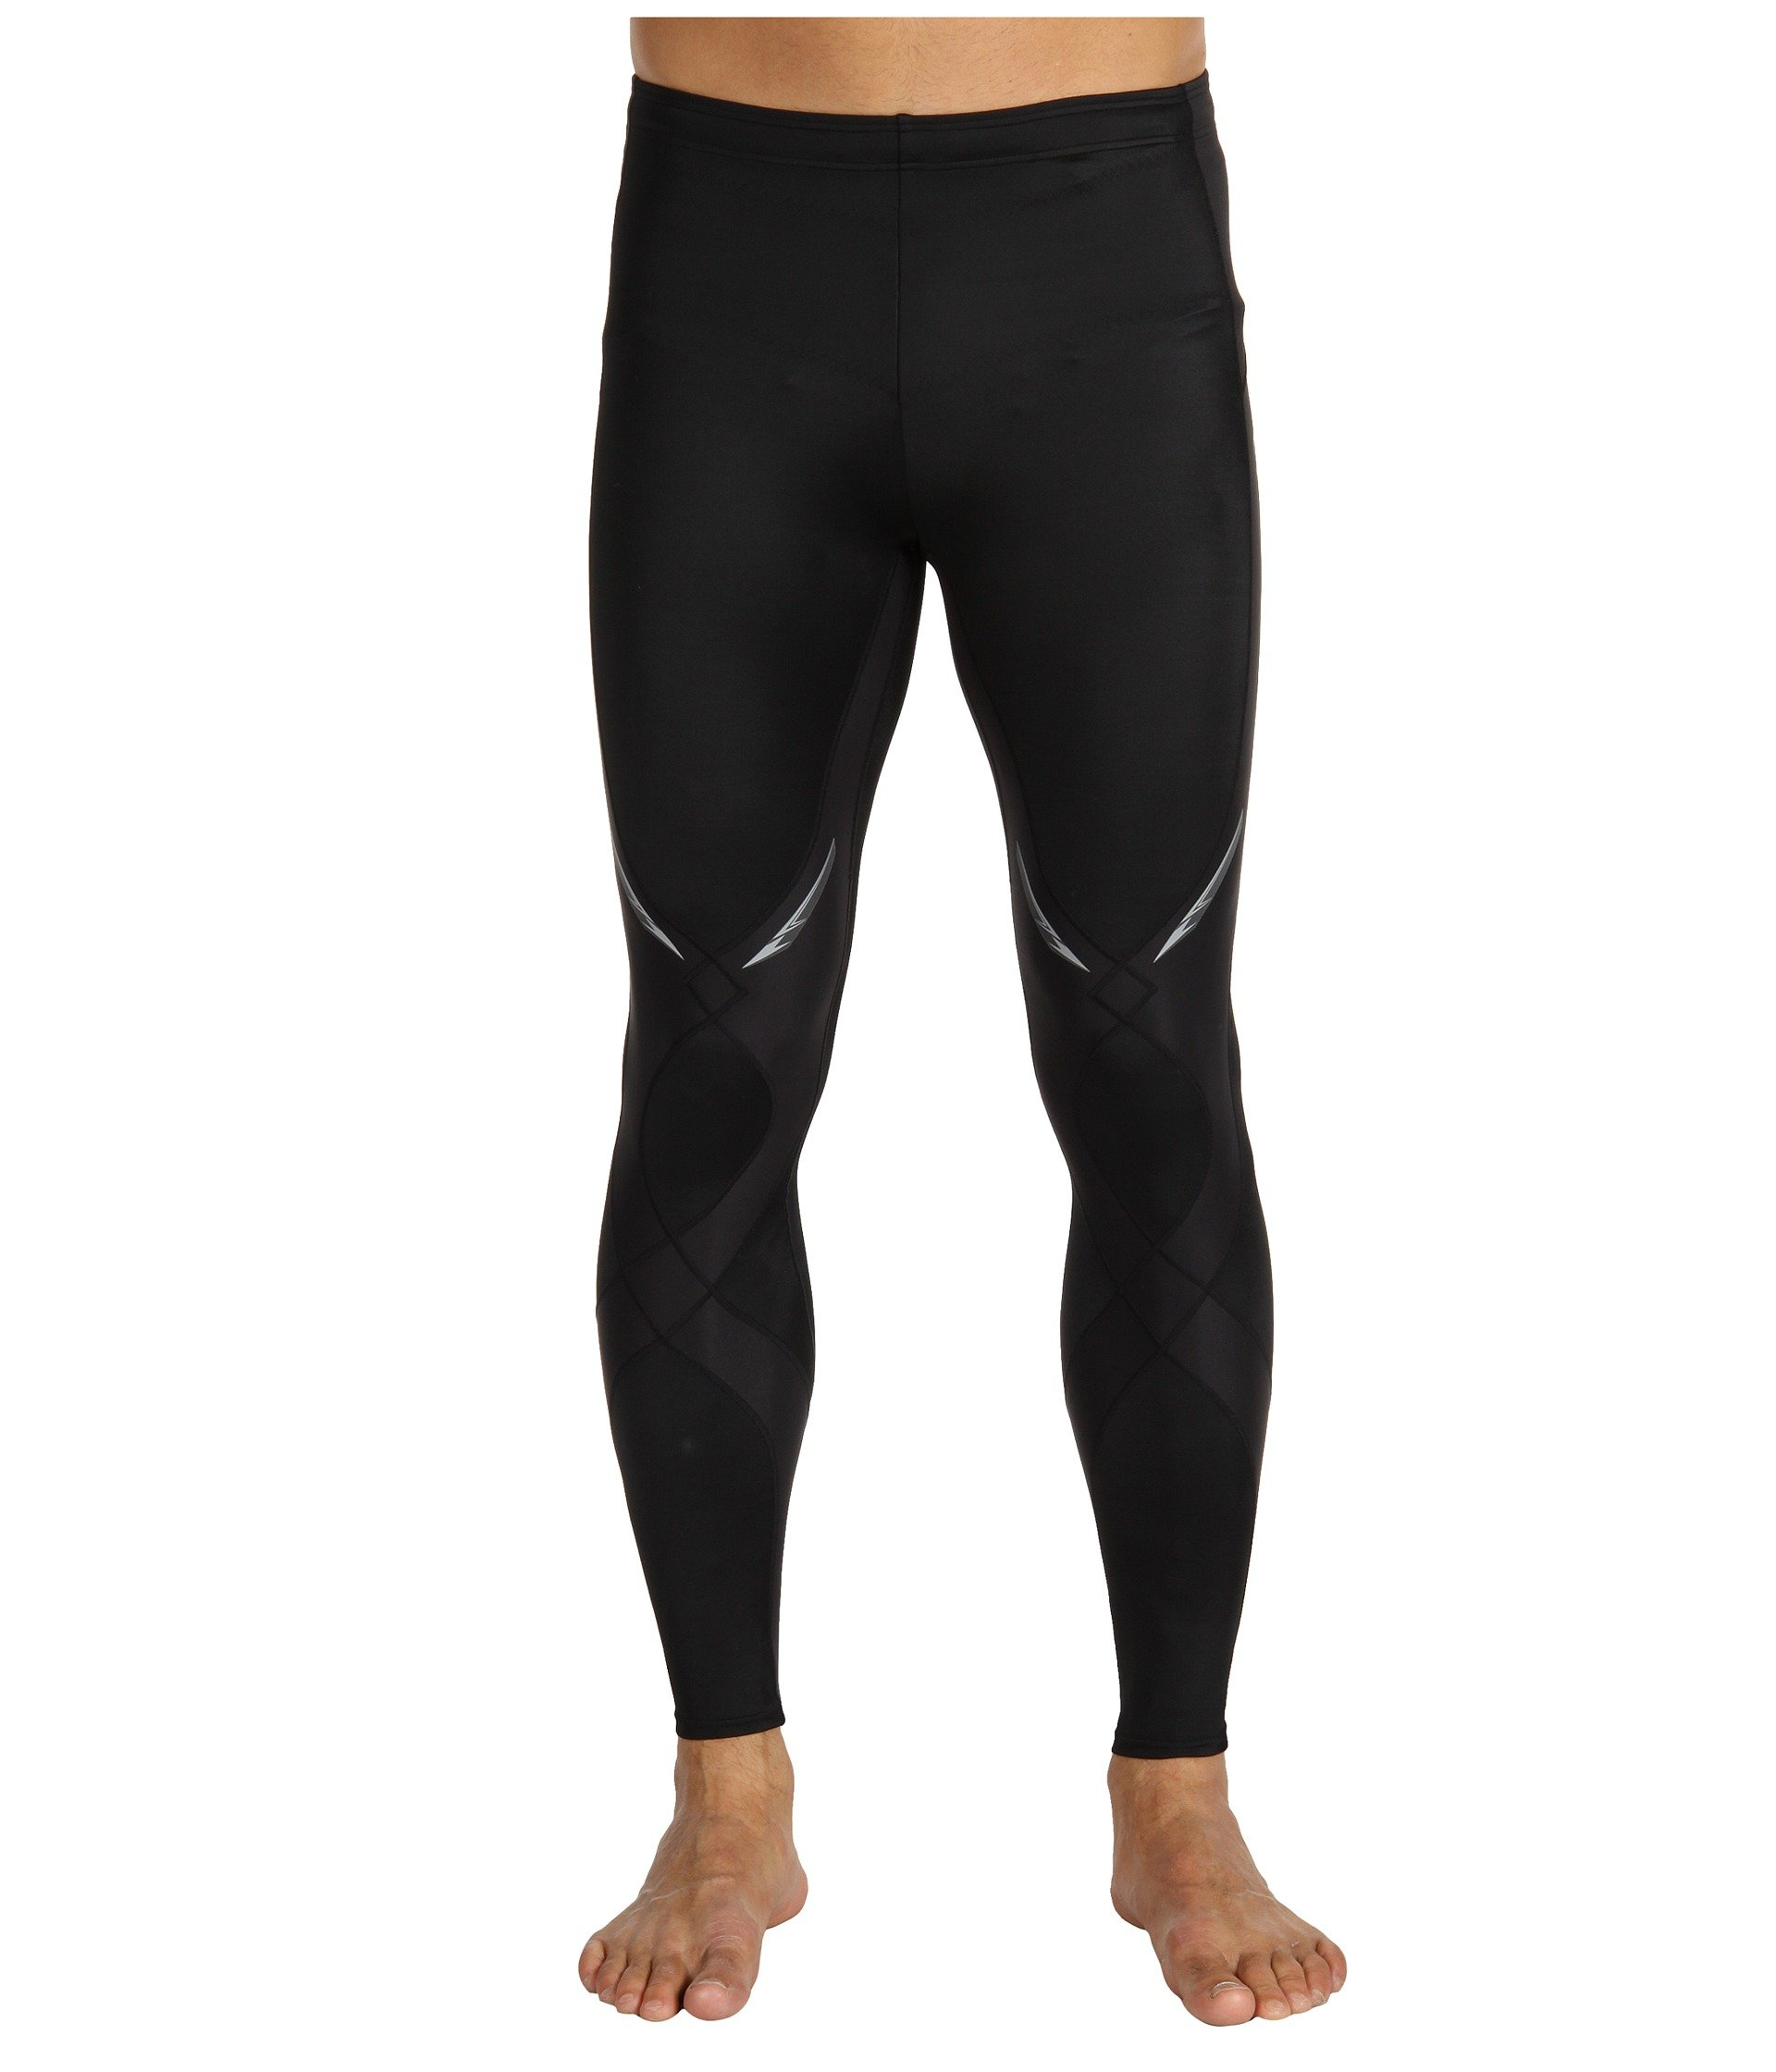 CW-X Stabilyx Tight Black Men's Running Pants 7828420